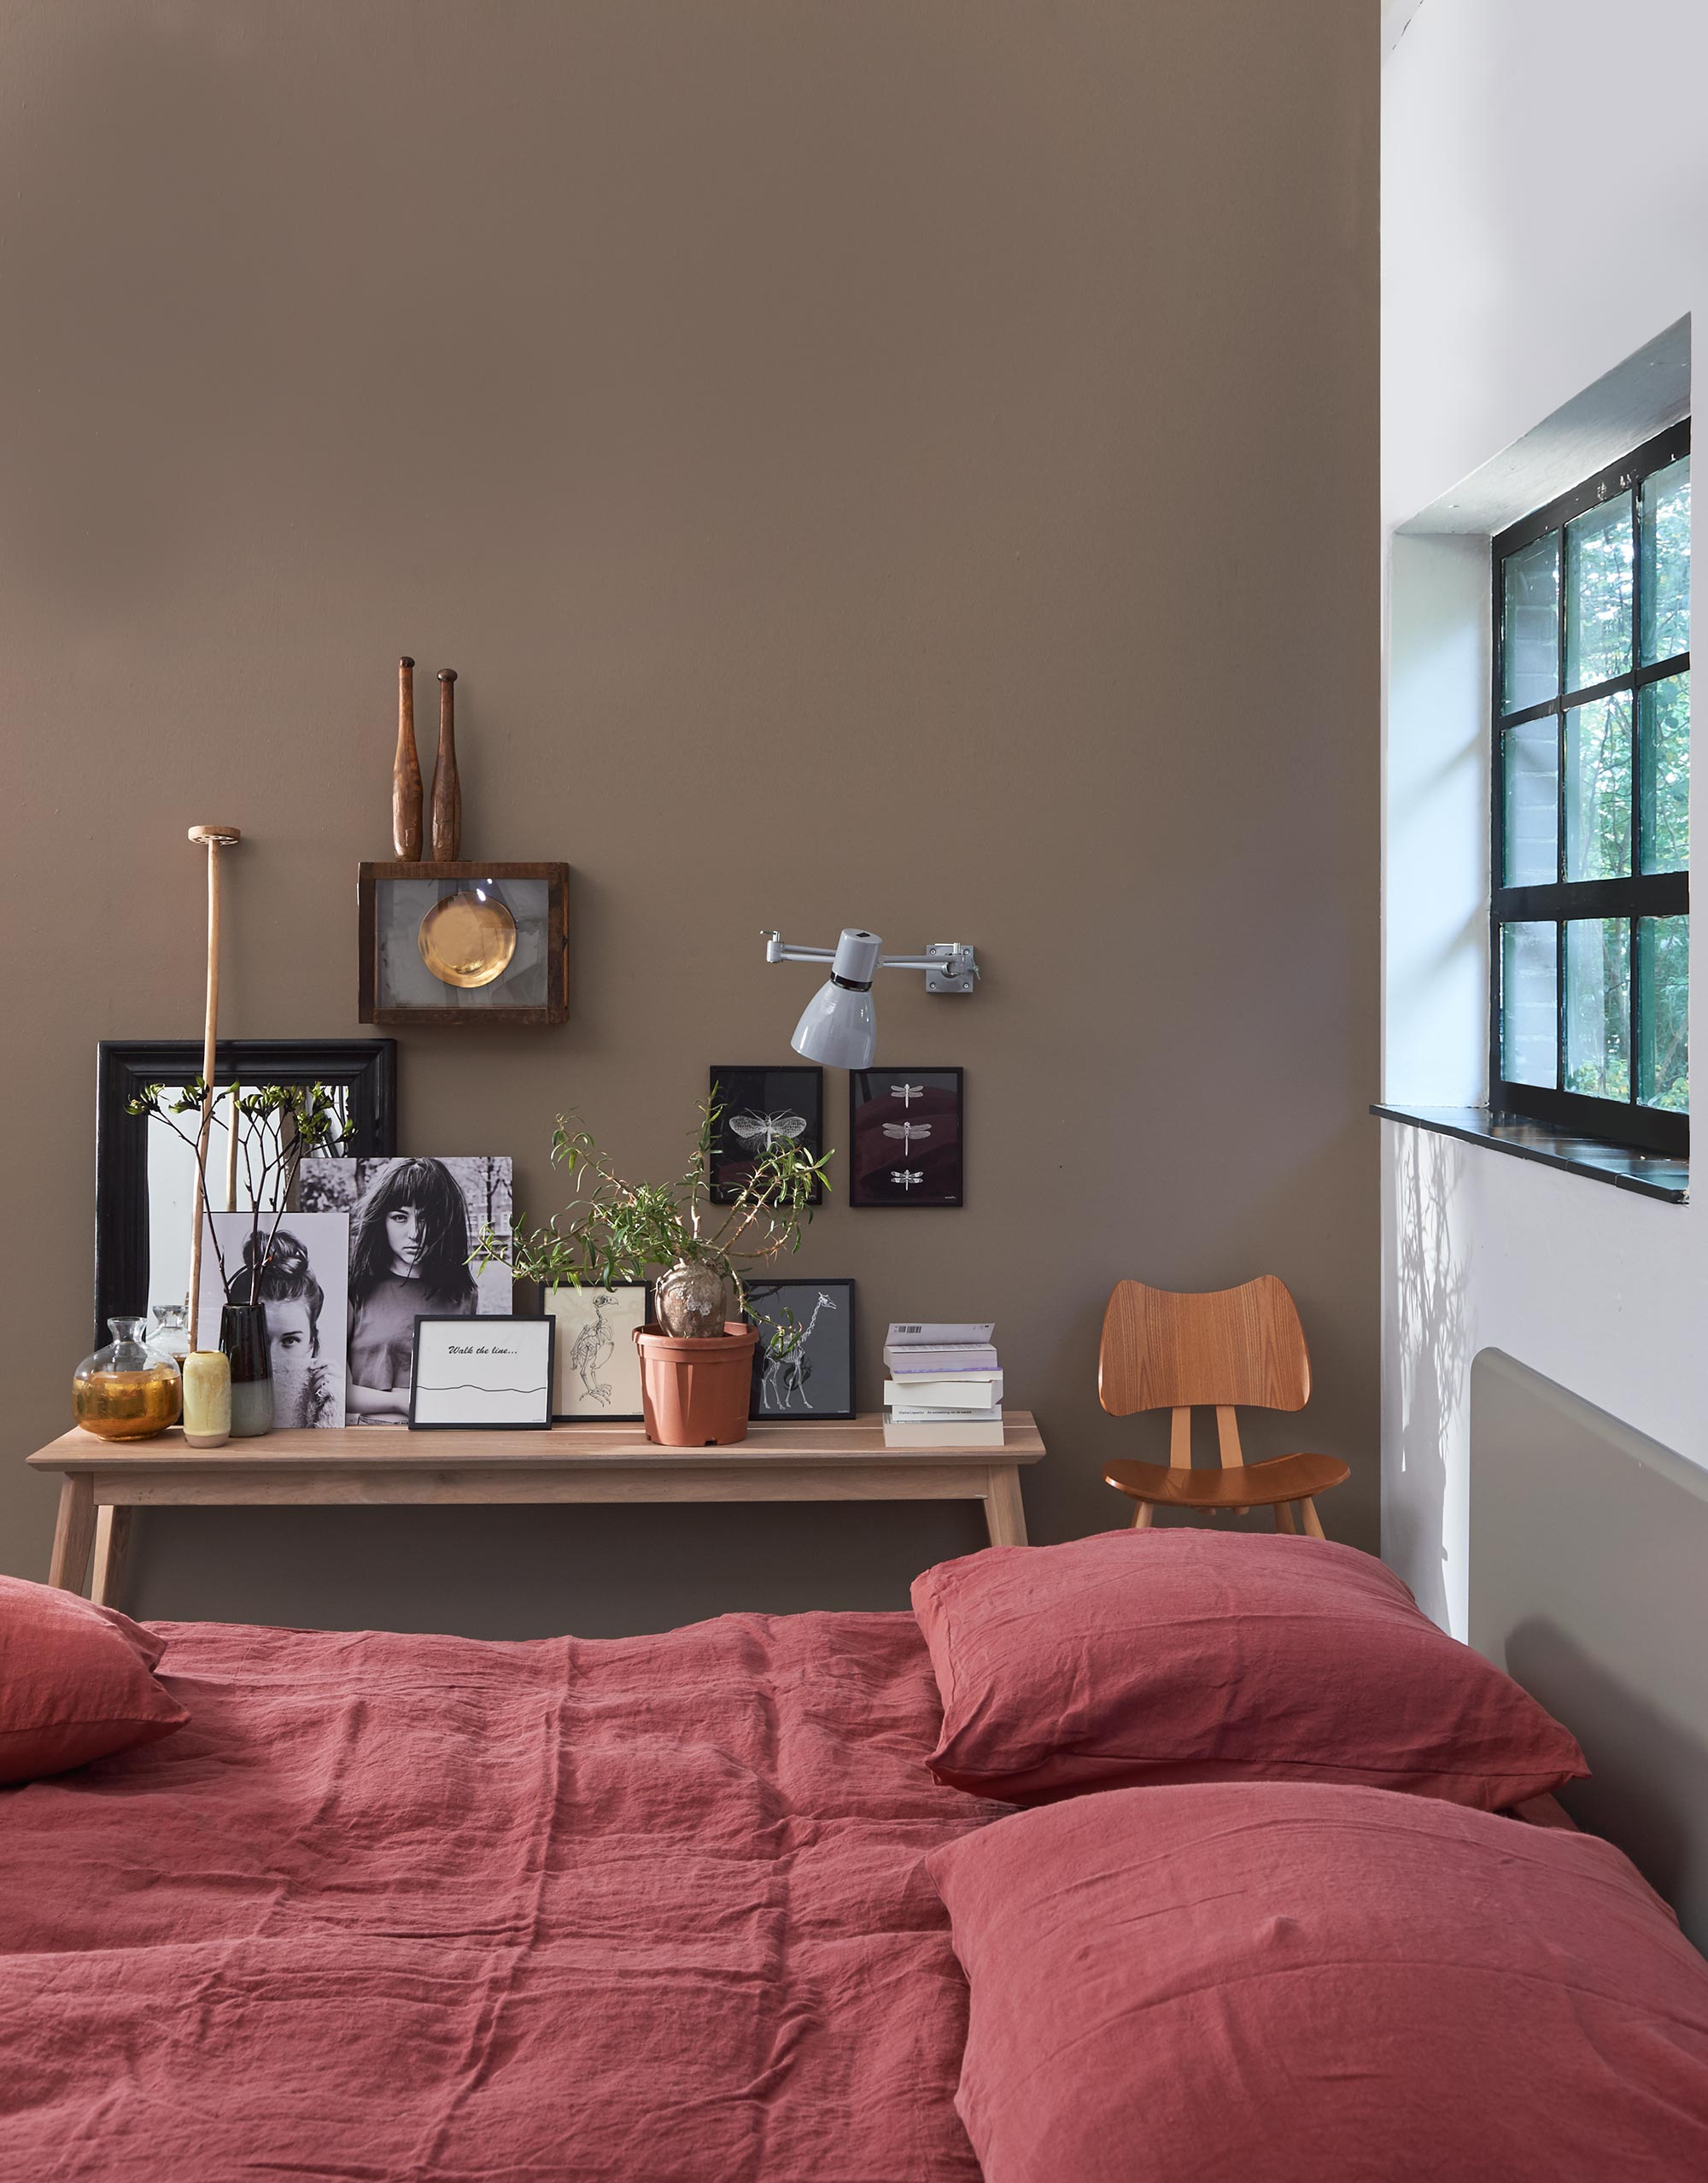 slaapkamer styling rood beddengoed